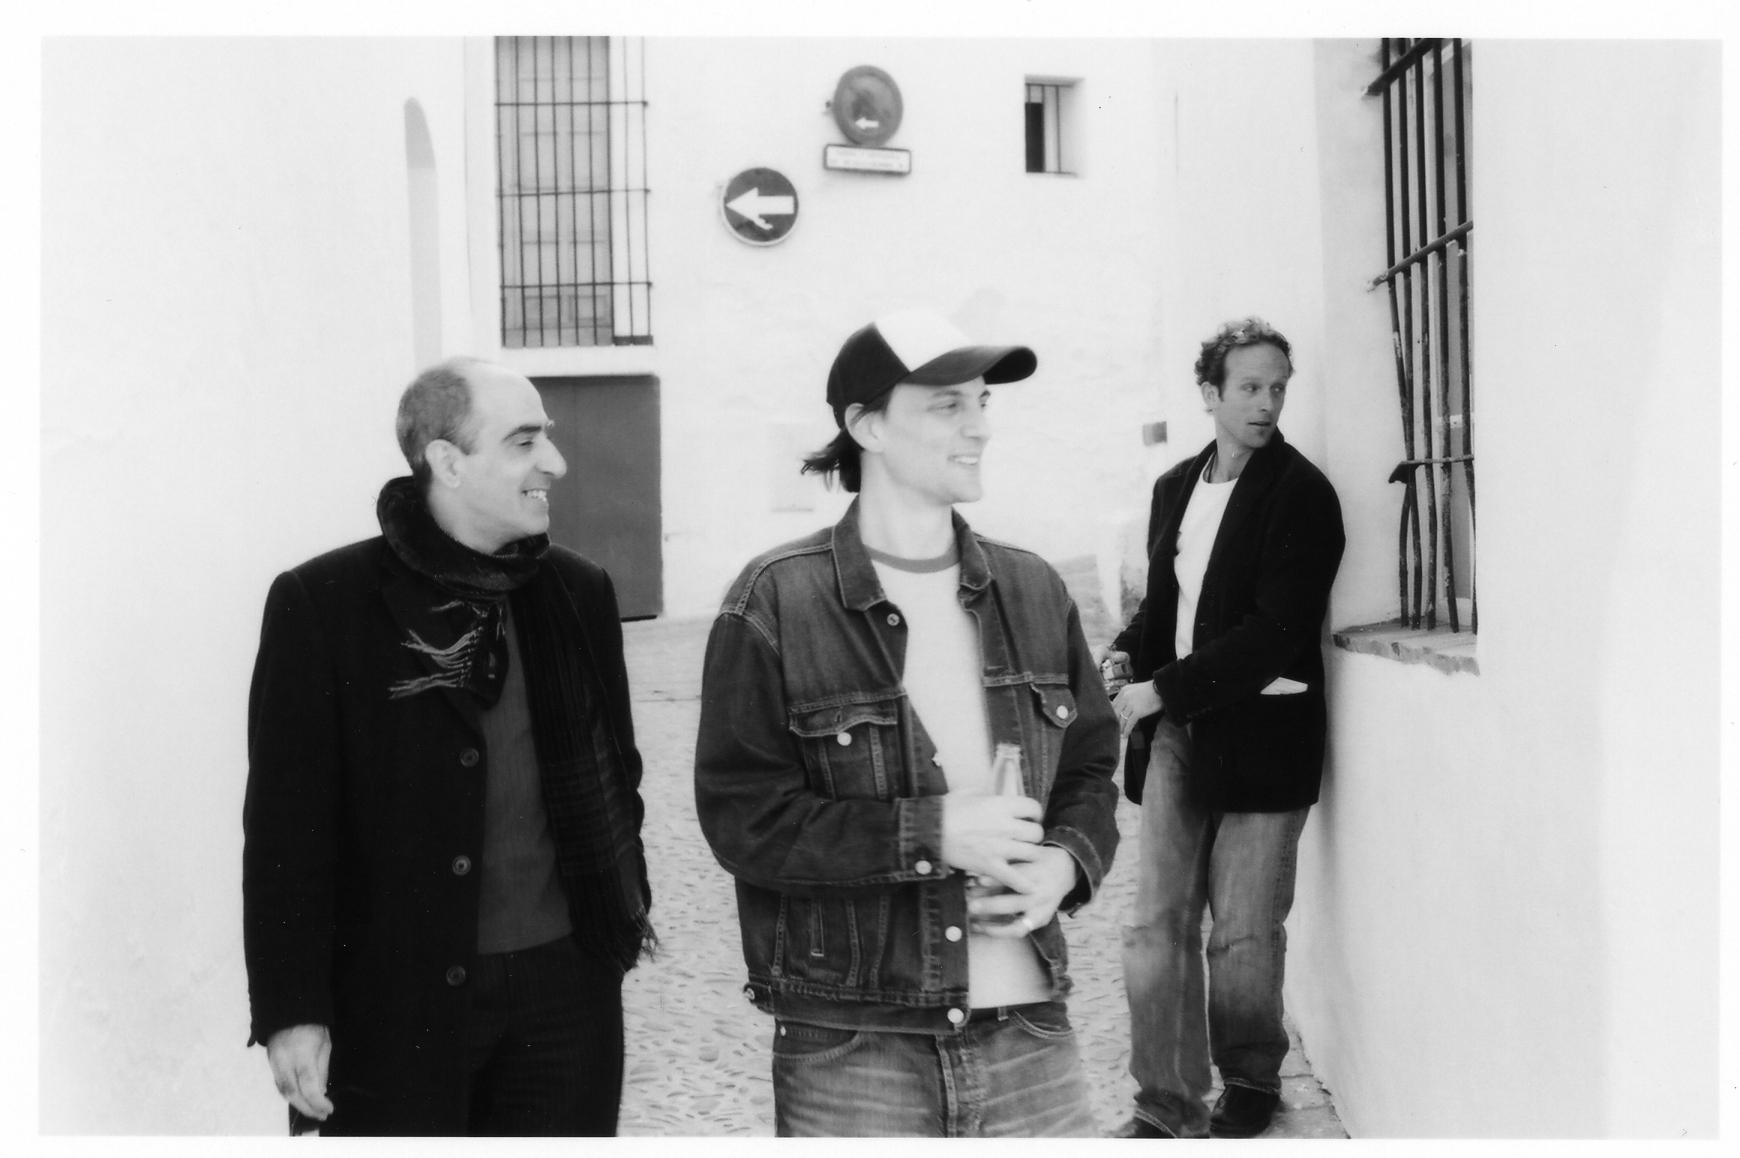 alberto&lucas&rob1.jpg